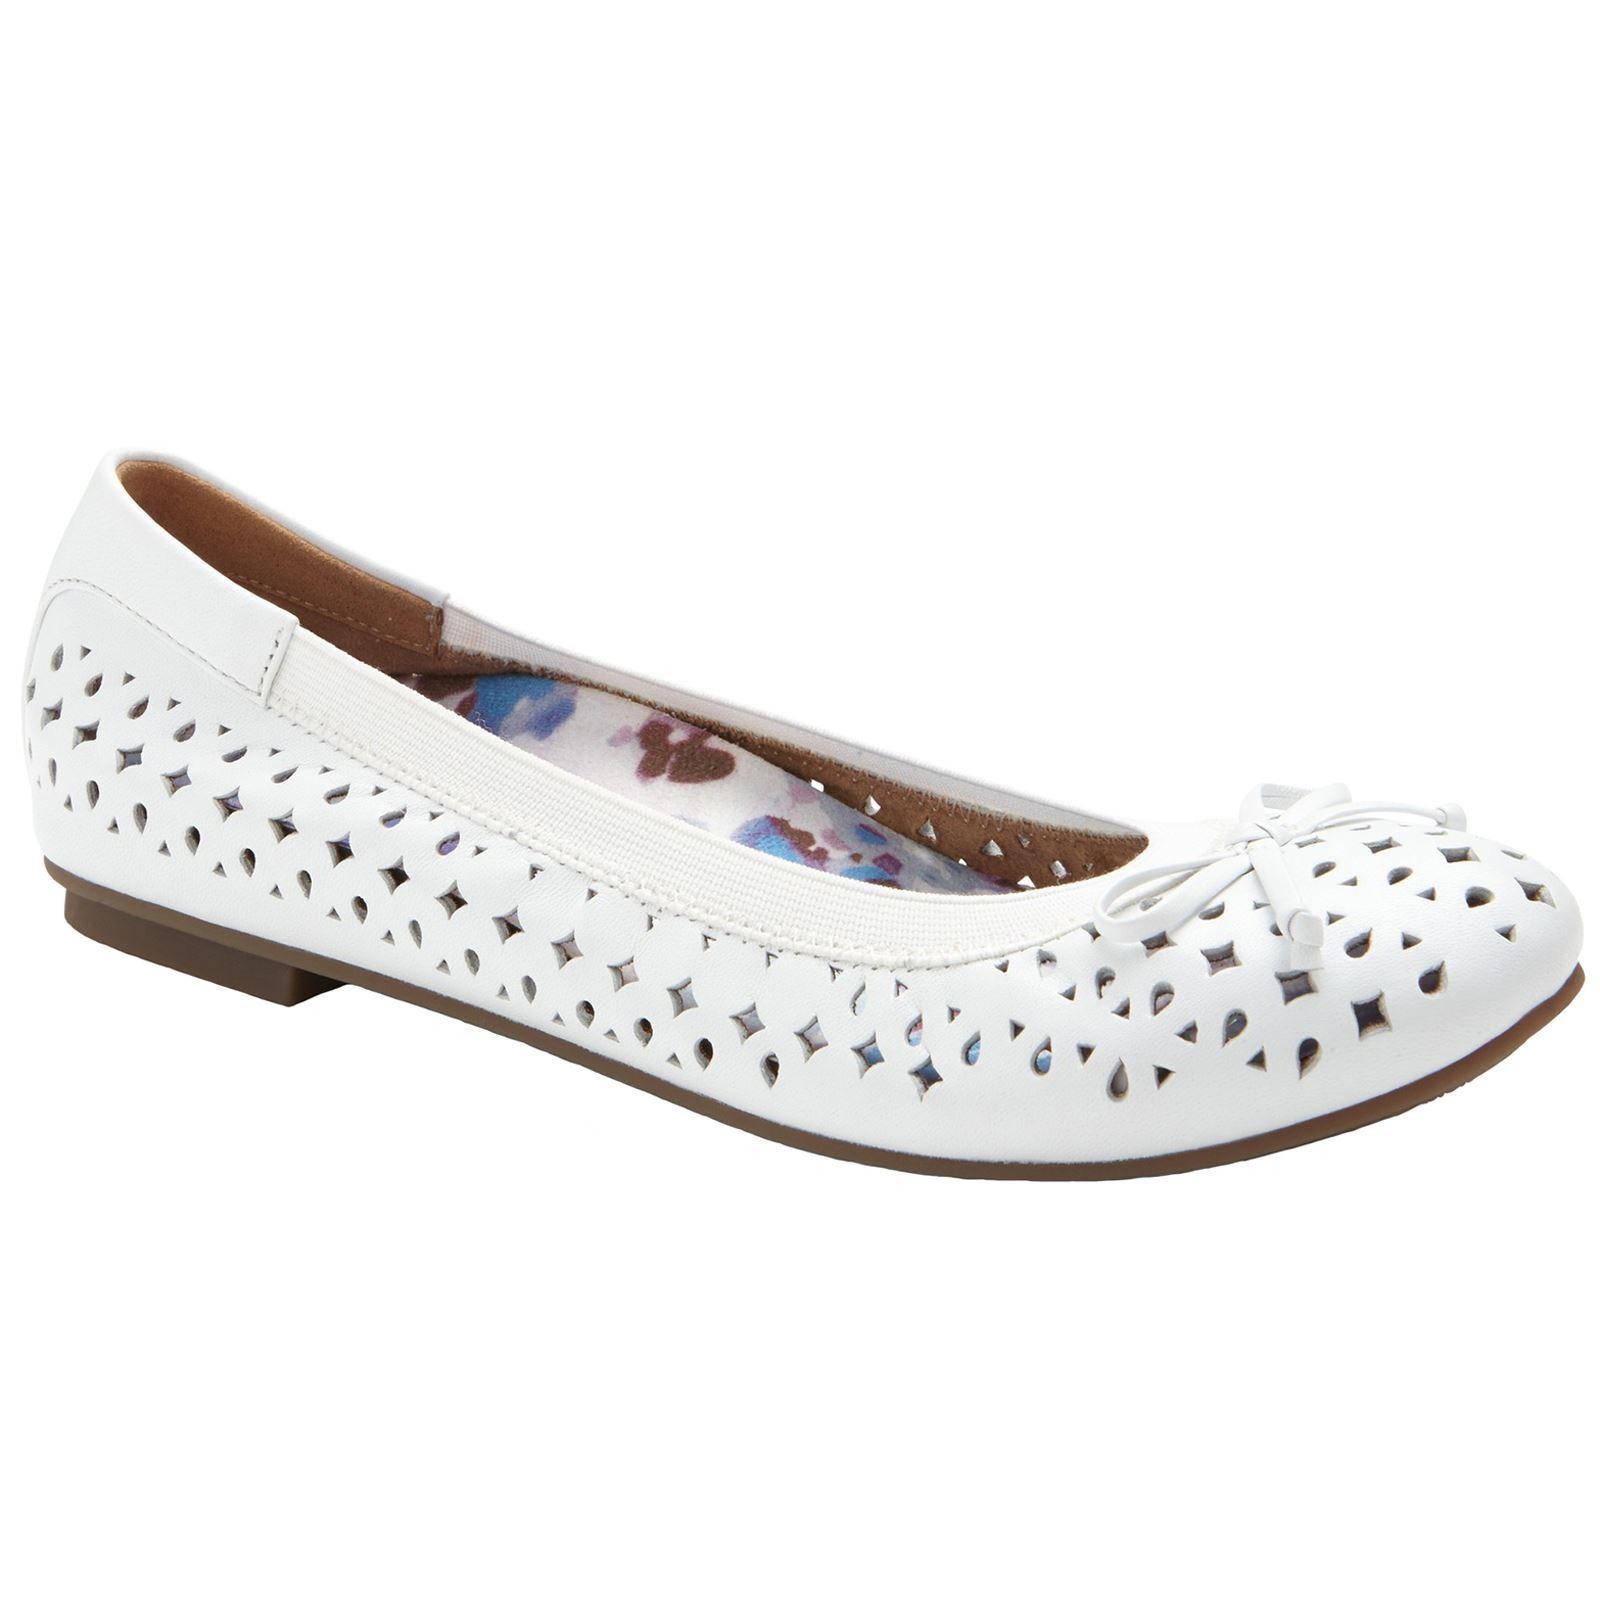 Vionic 359 Spark zapatos surin blanco mujer Leather ballet Flats bailarinas zapatos Spark 7a9f44